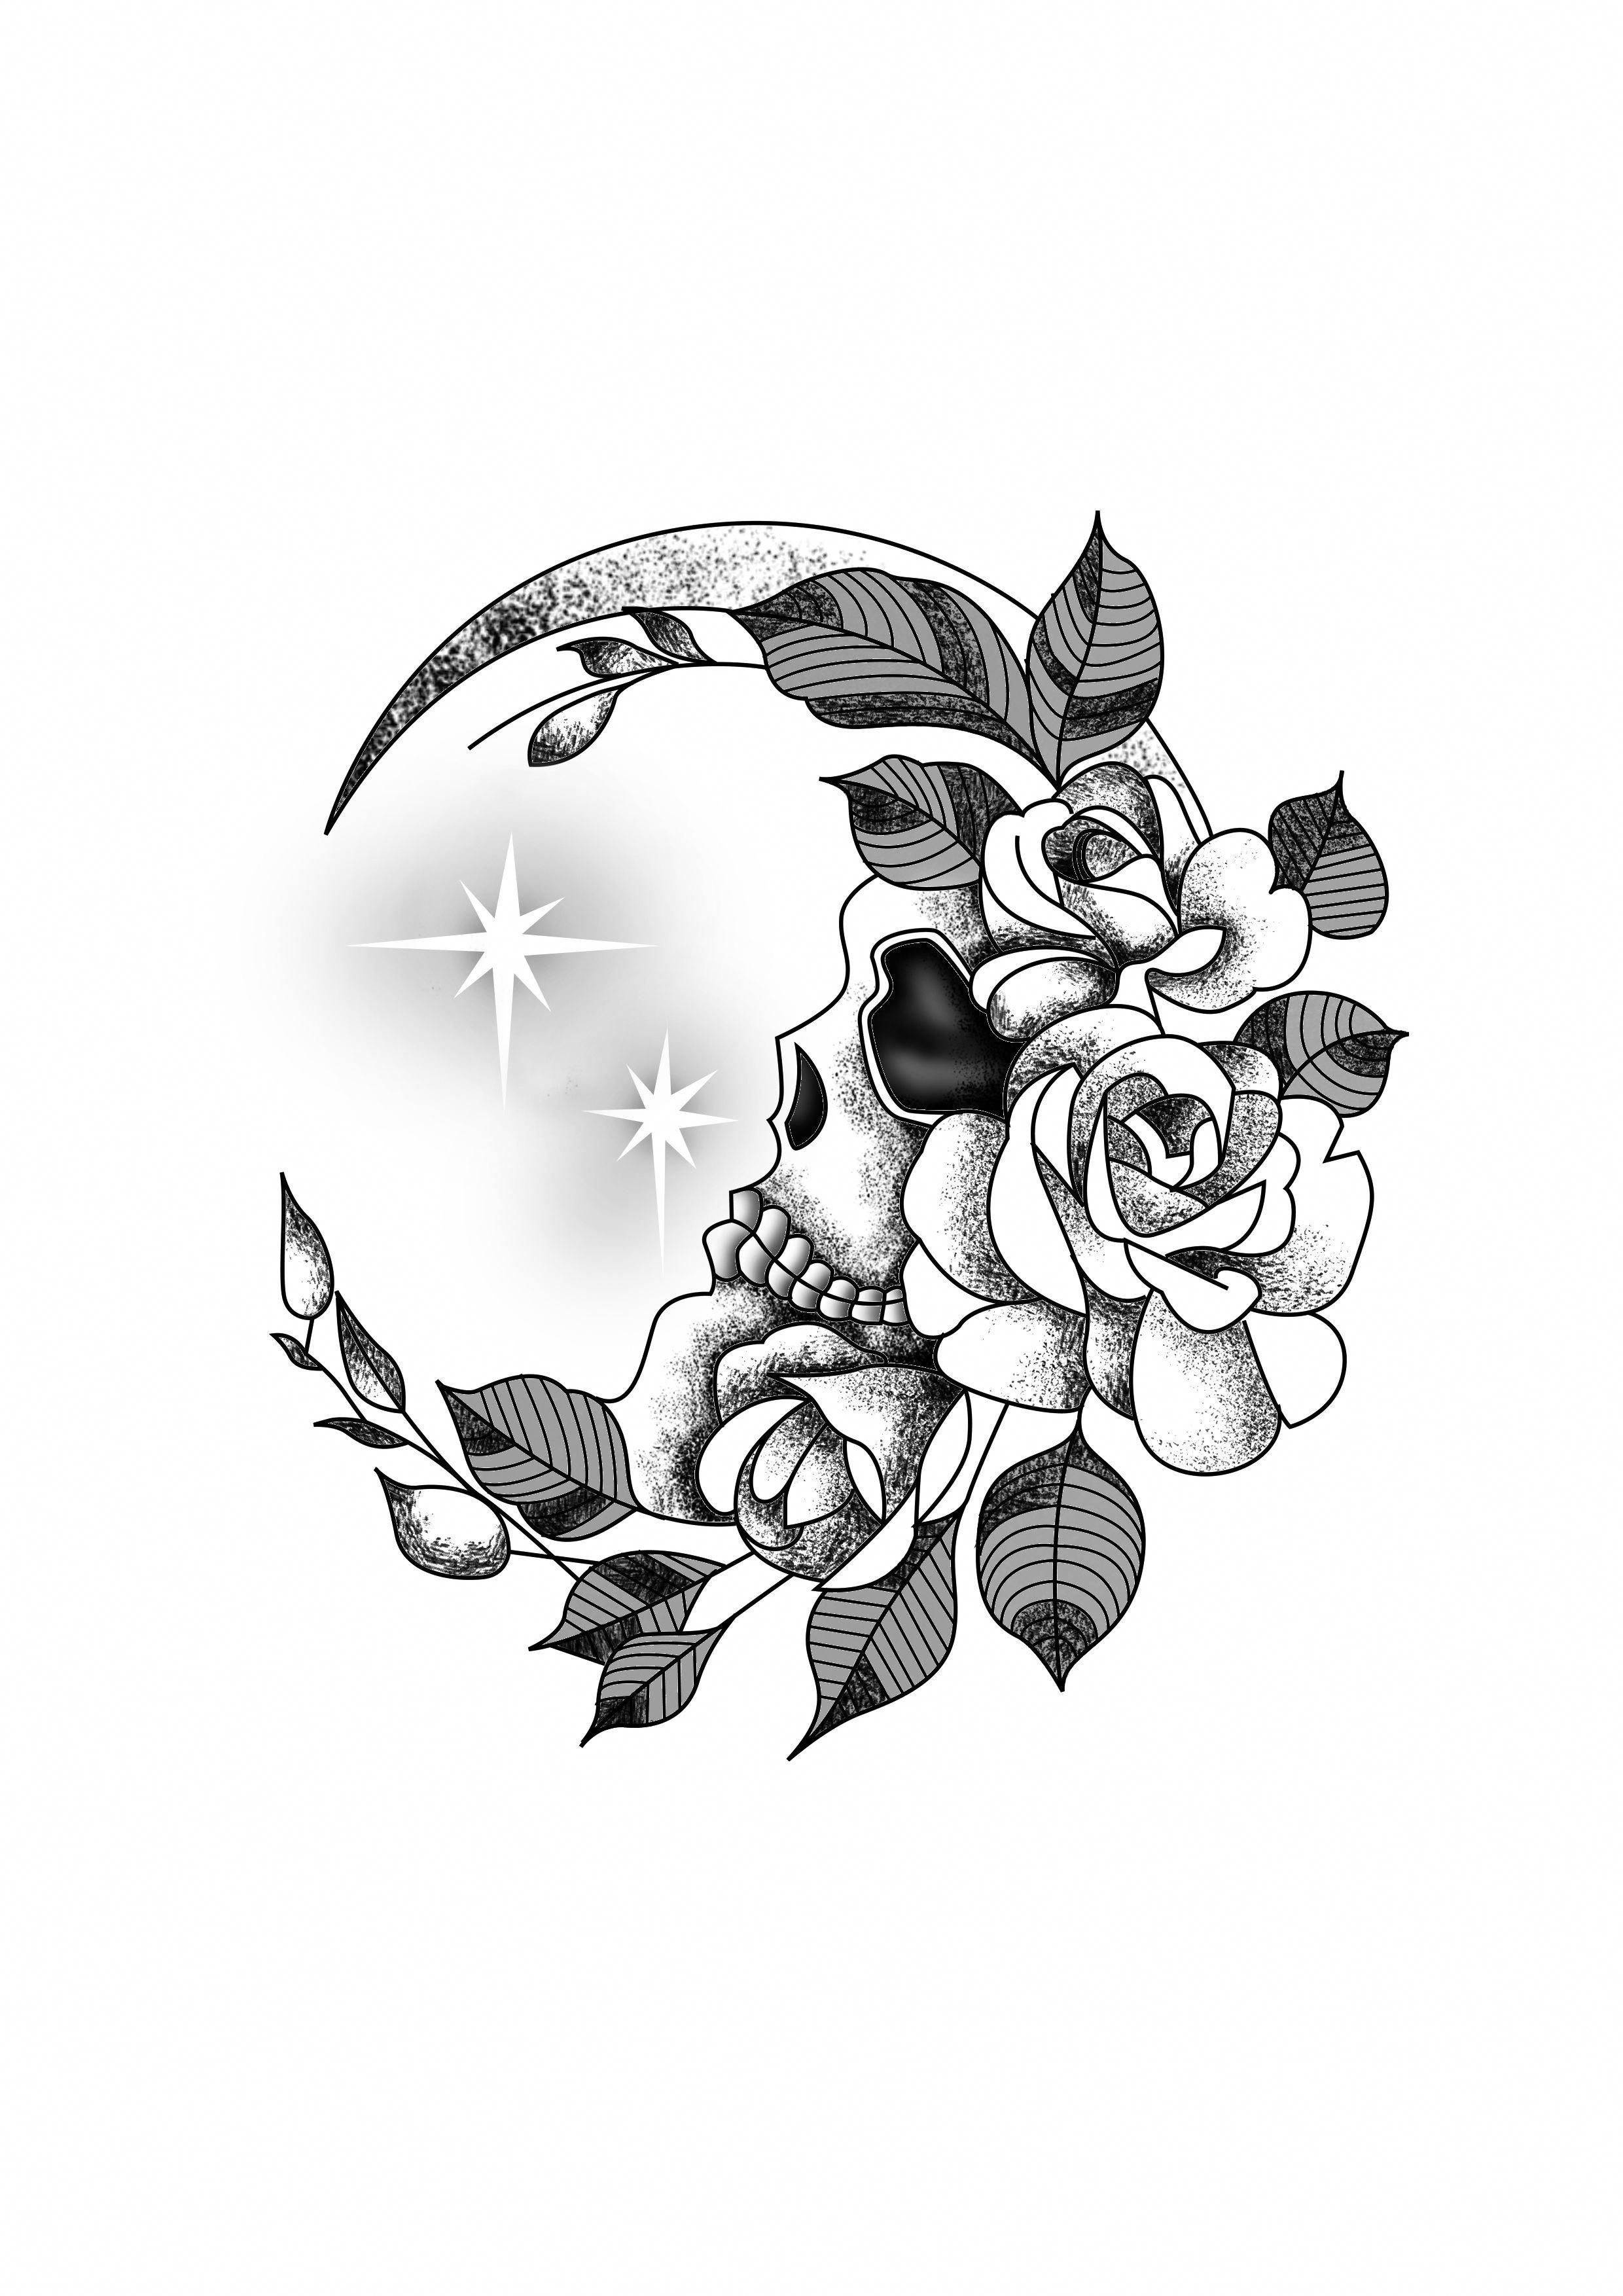 Flower Crescent Moon Skull Wrist Tattoo Design Black & White. Designer: Andrija Protic #tattoodesigns #caveiratattoo